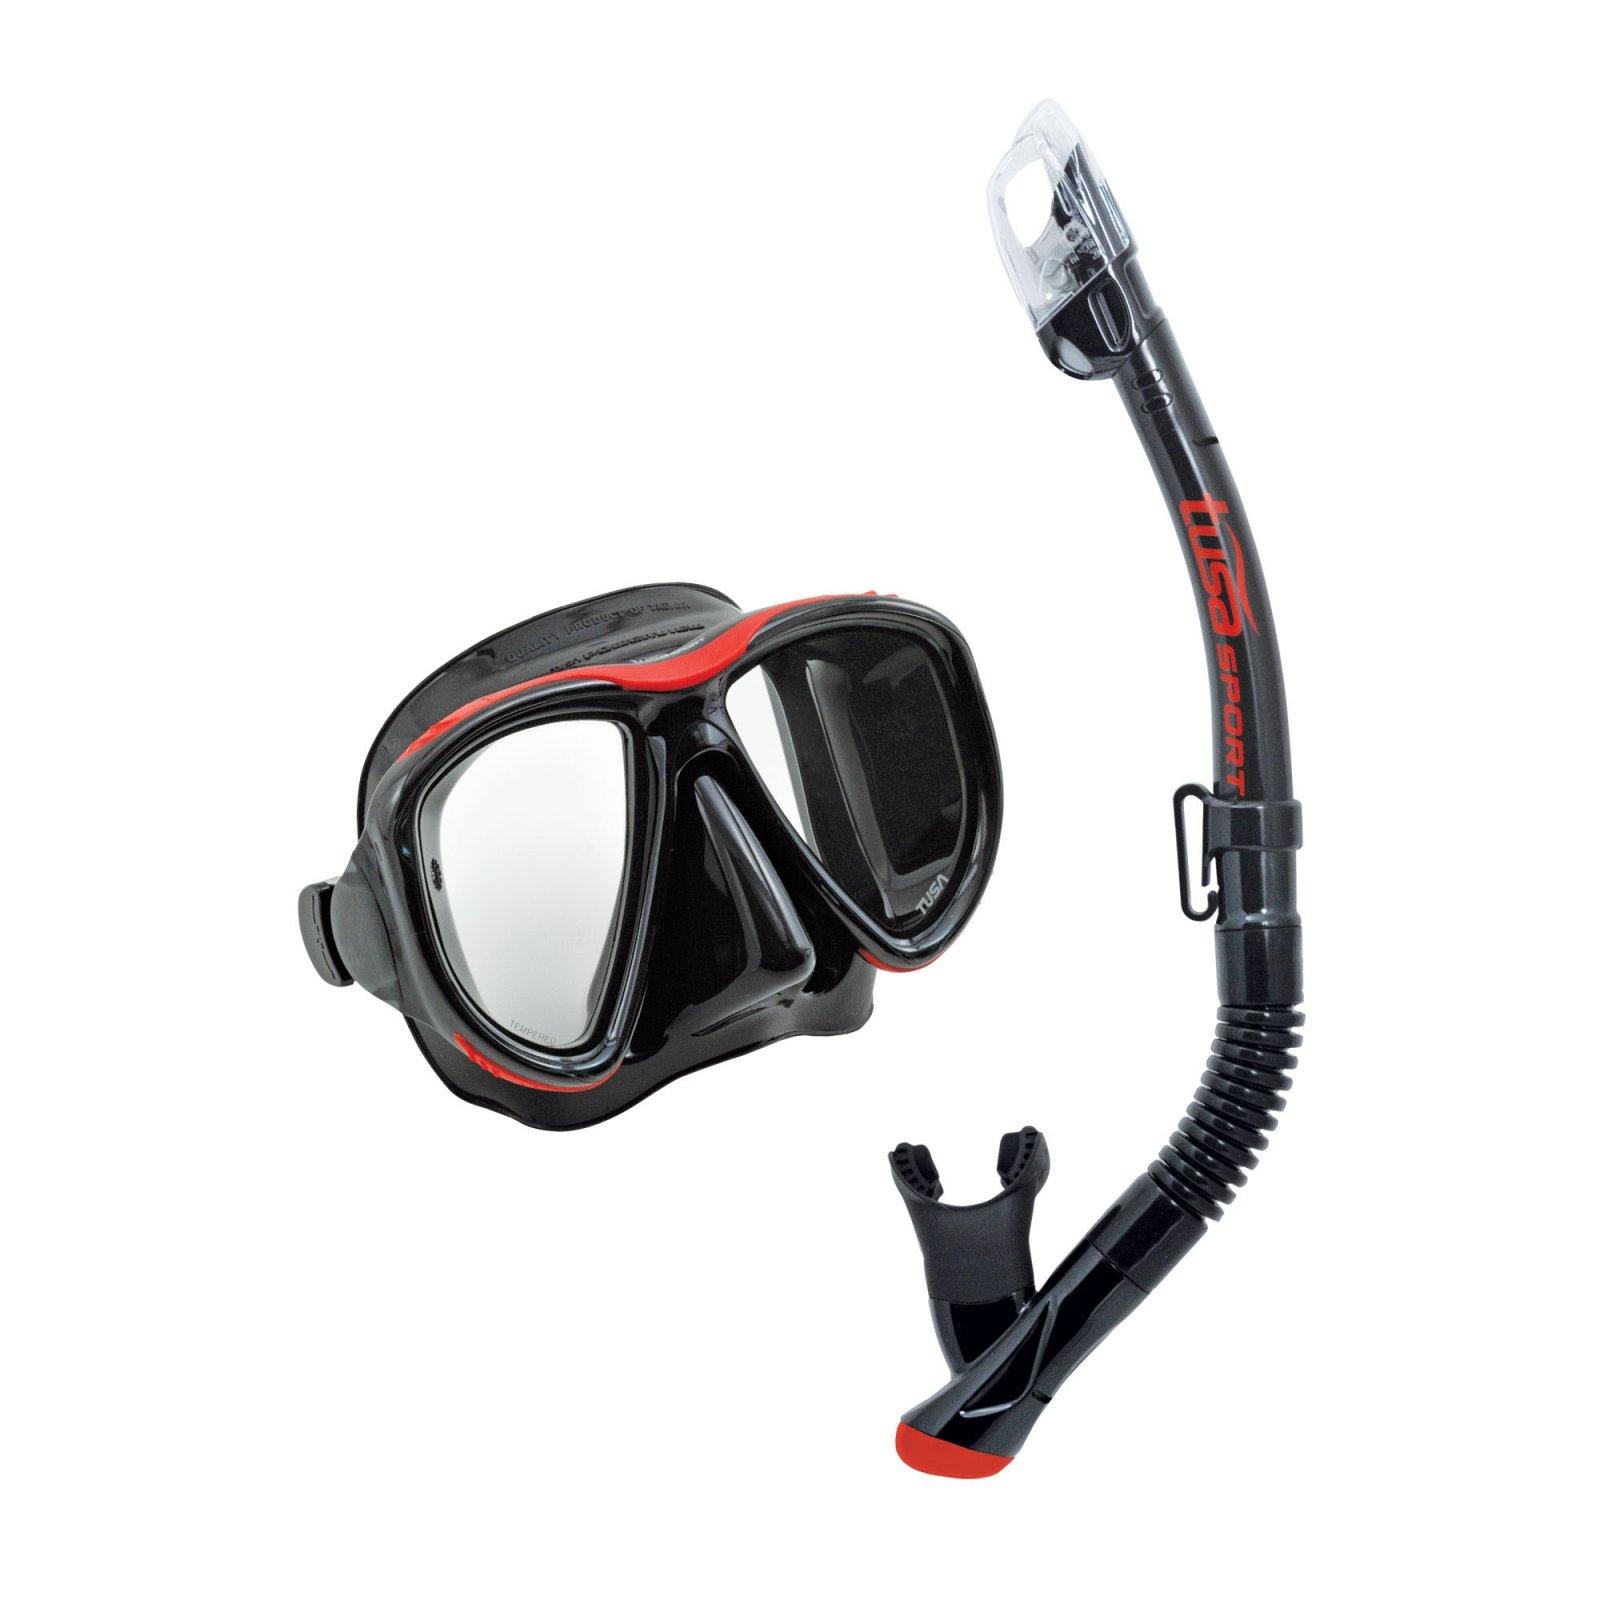 TUSA Powerview Adult Mask & Snorkel Set